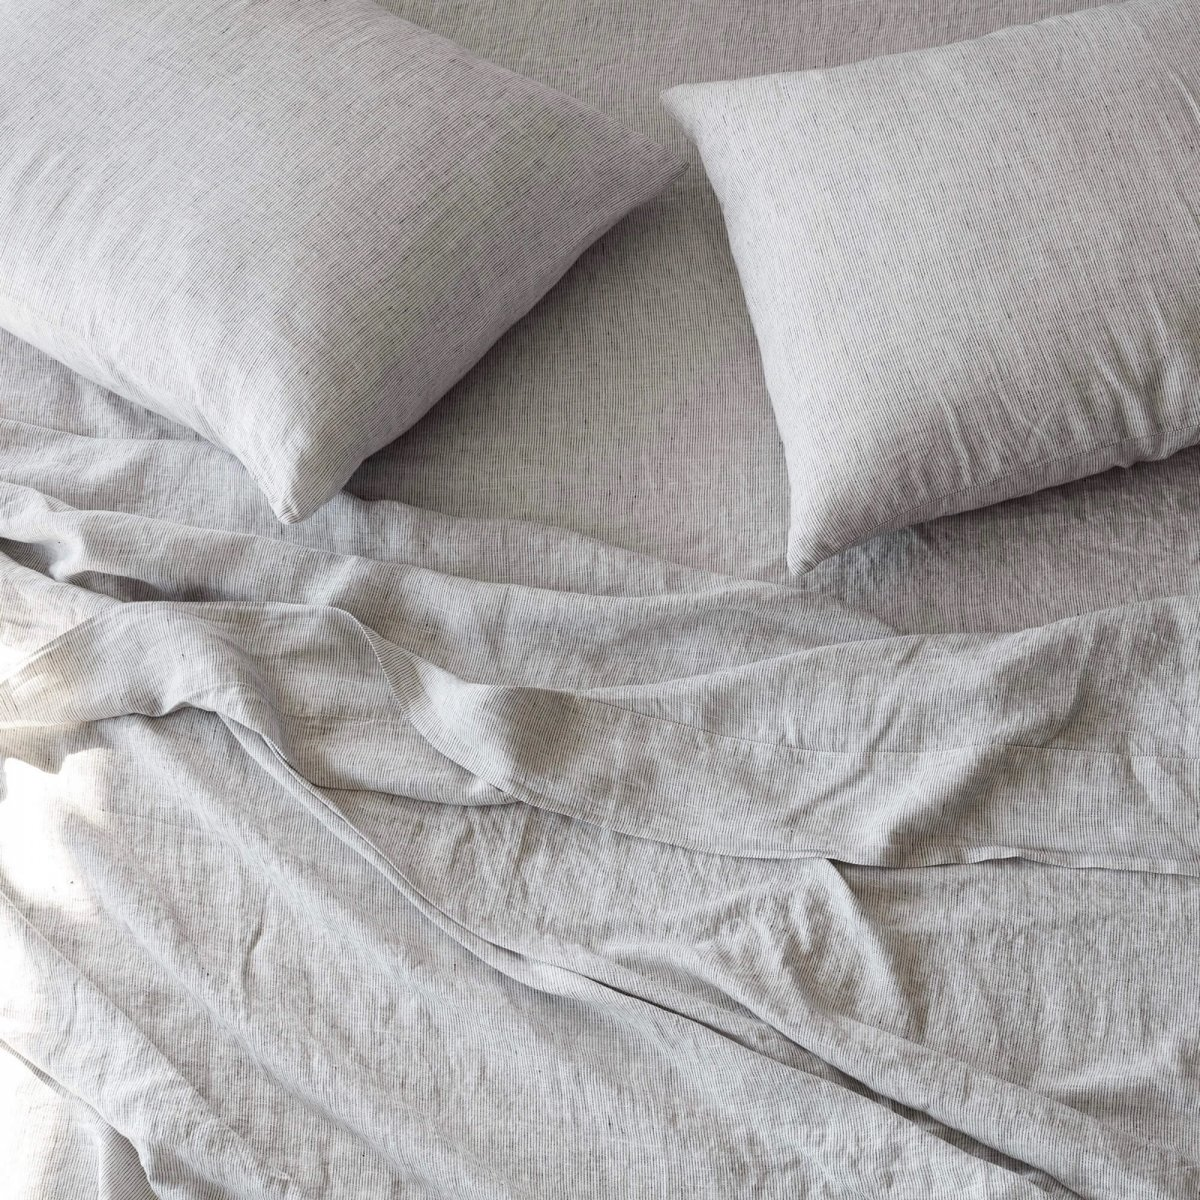 Stonewashed Linen Bed Bundle, graphite stripe.